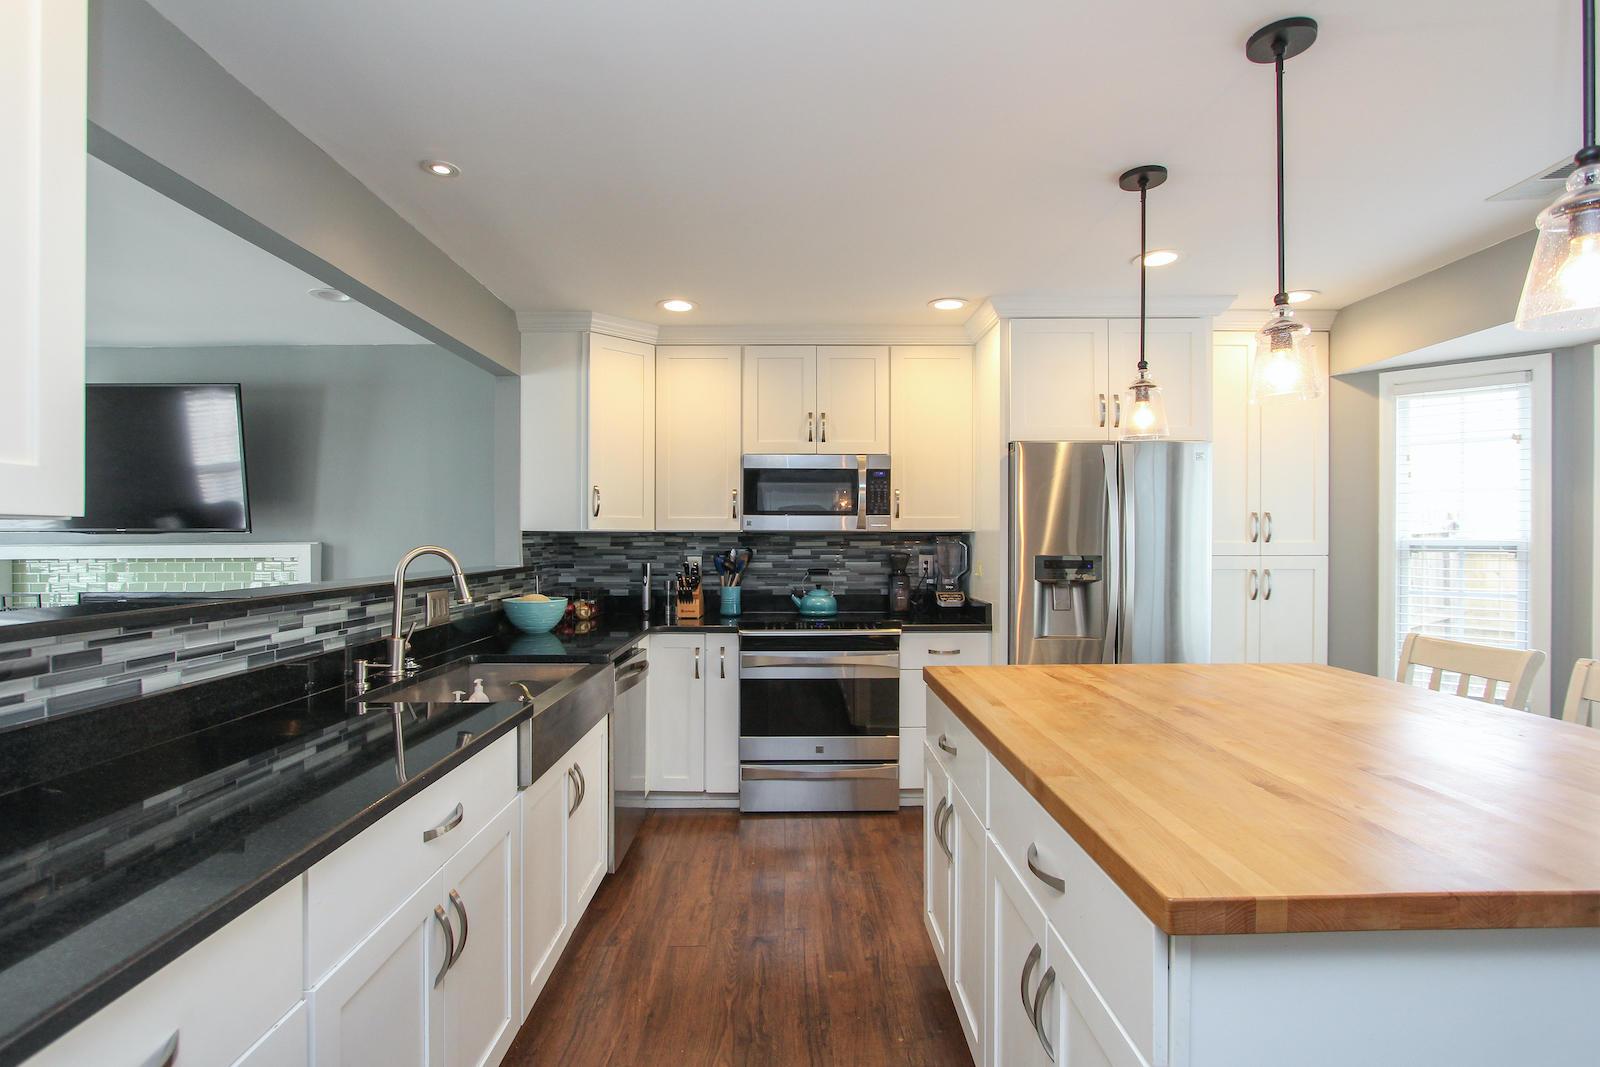 Landings Run Homes For Sale - 1548 Wickfield, Mount Pleasant, SC - 14